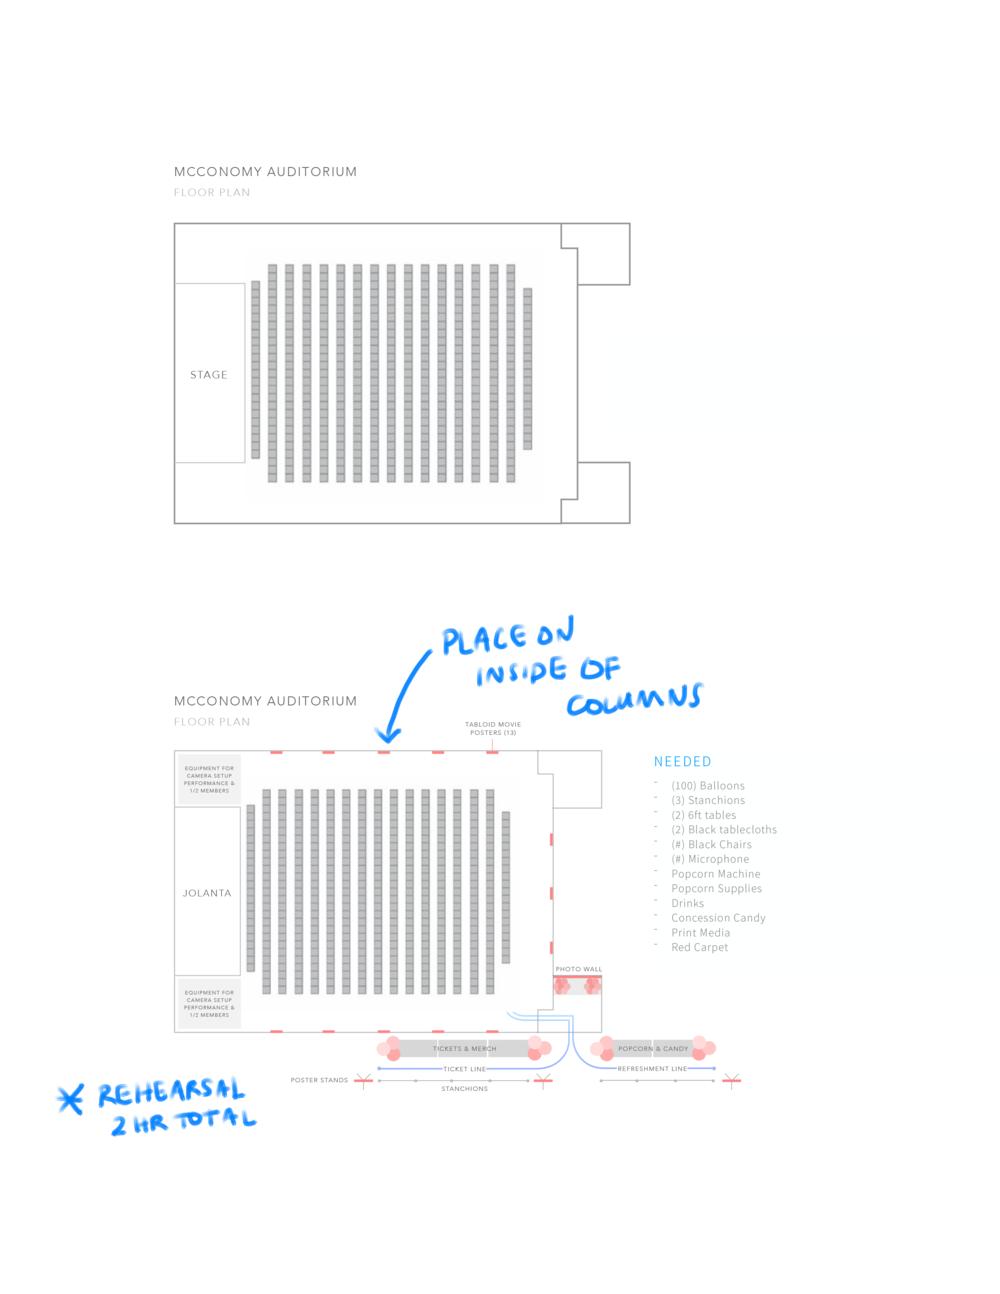 diagrams 2 mconomy 1.png